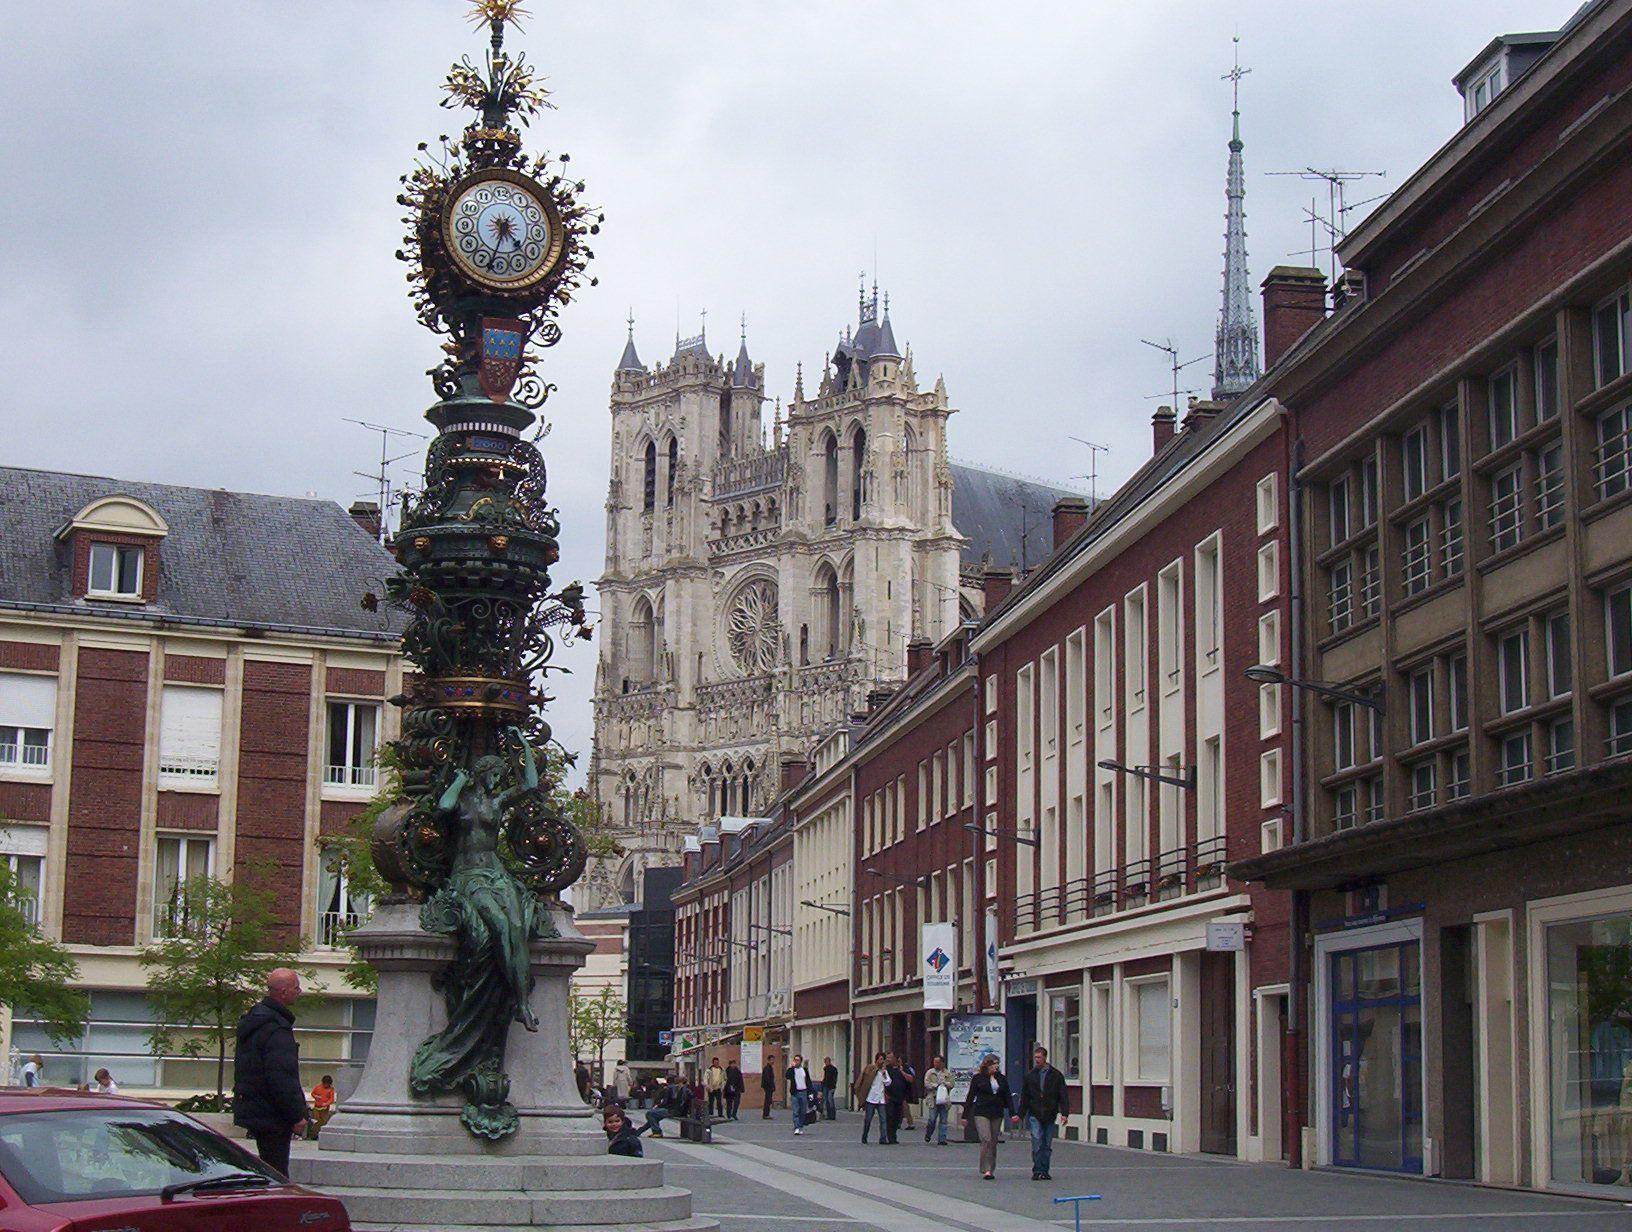 Amiens_-_Horloge_Dewailly